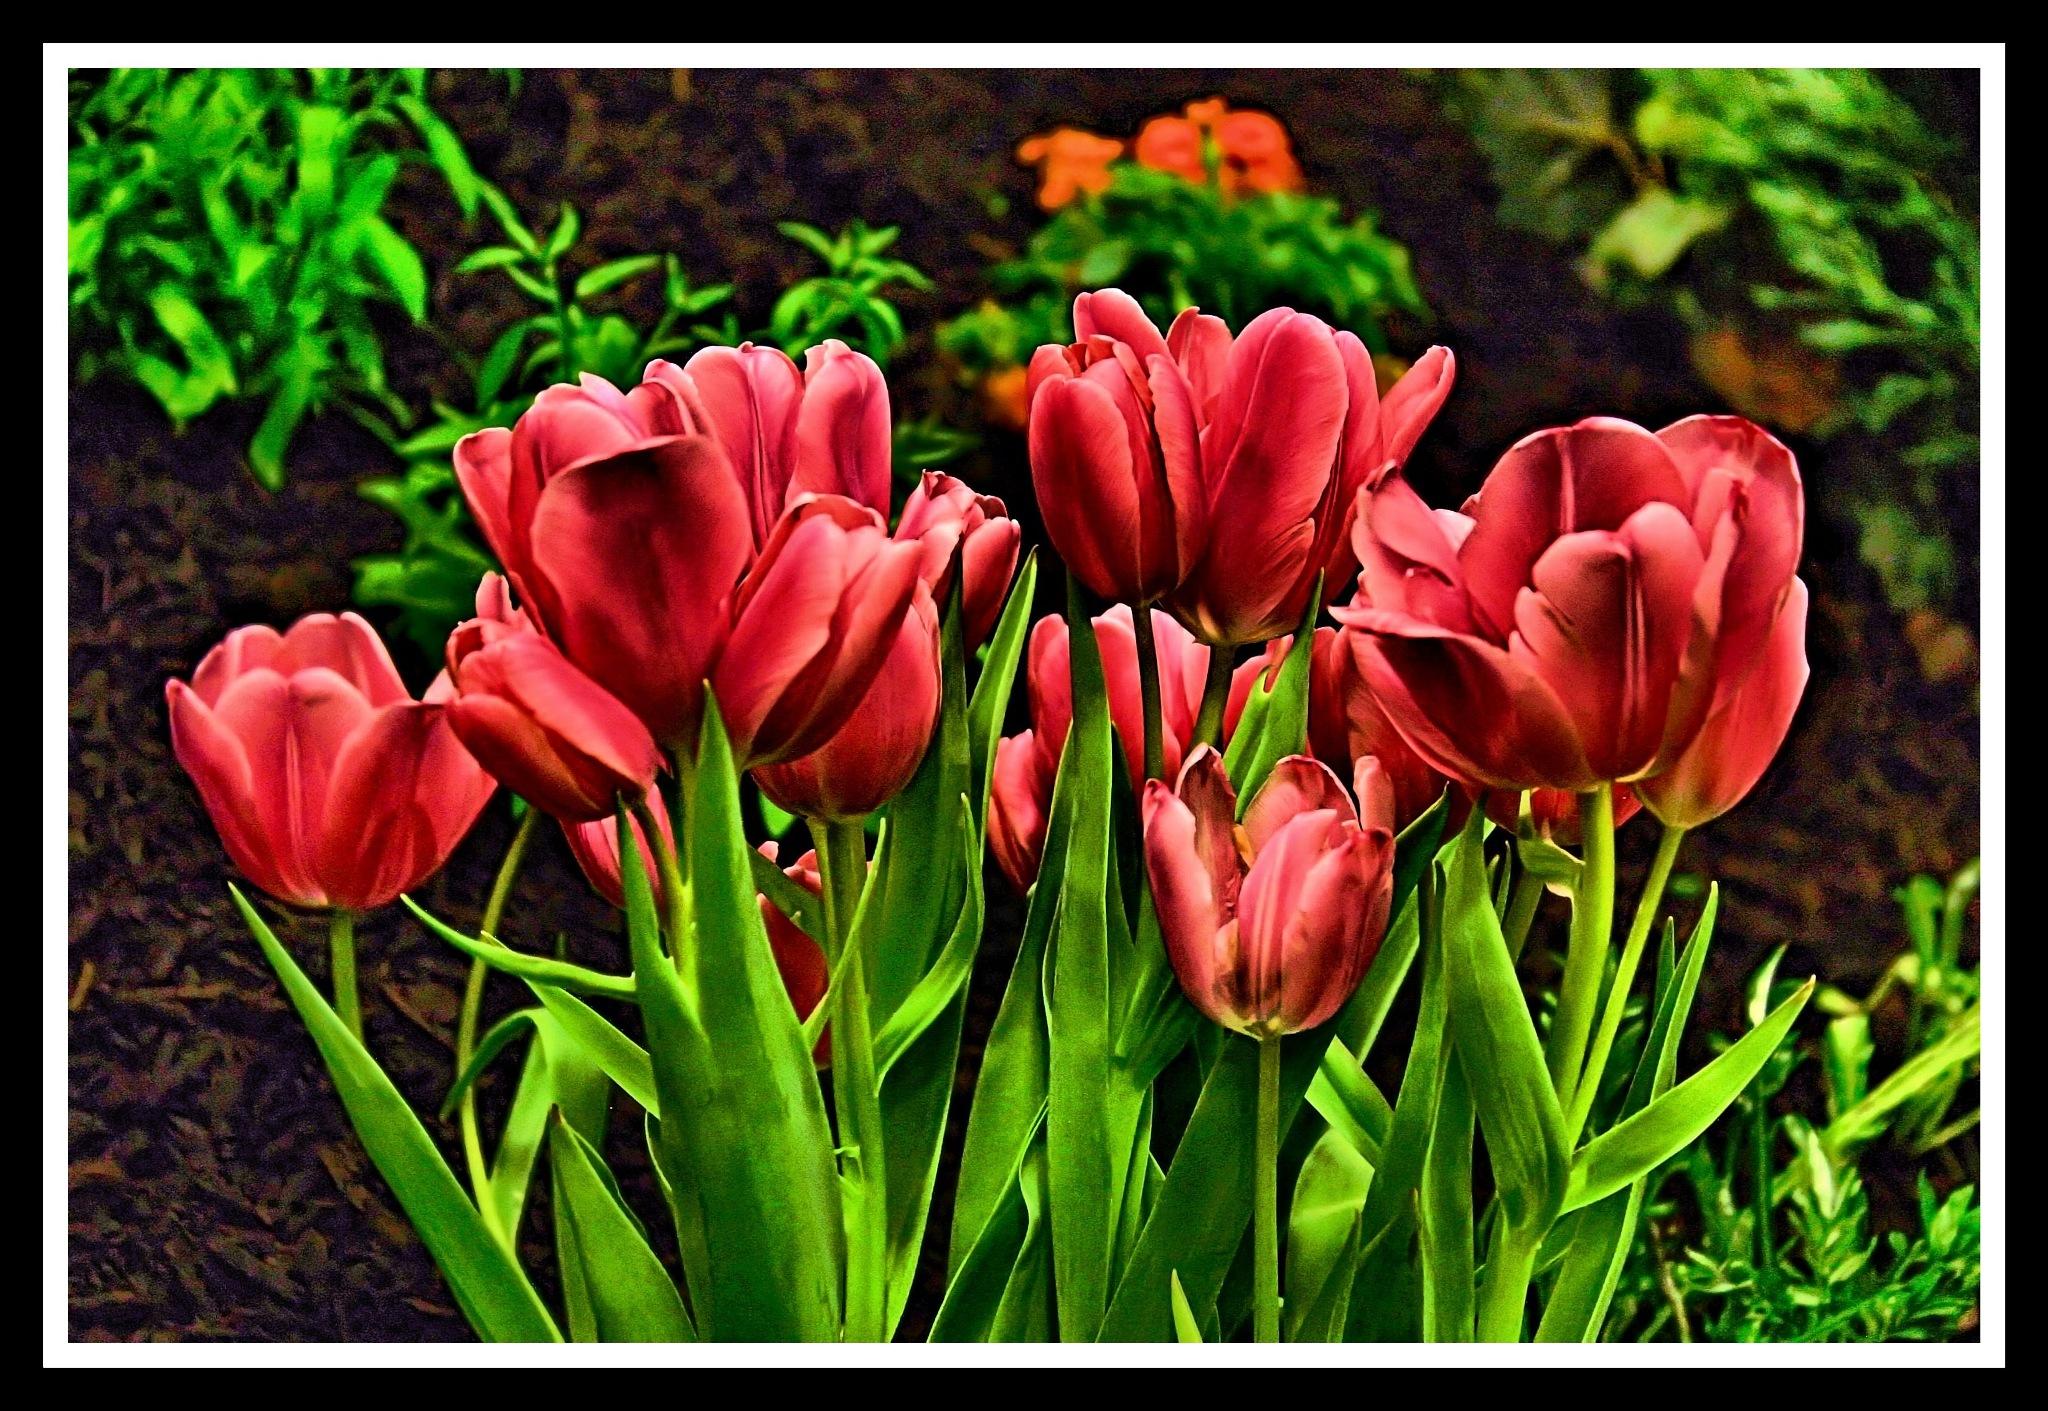 Tulip Bed by Daniel J. Ruggiero